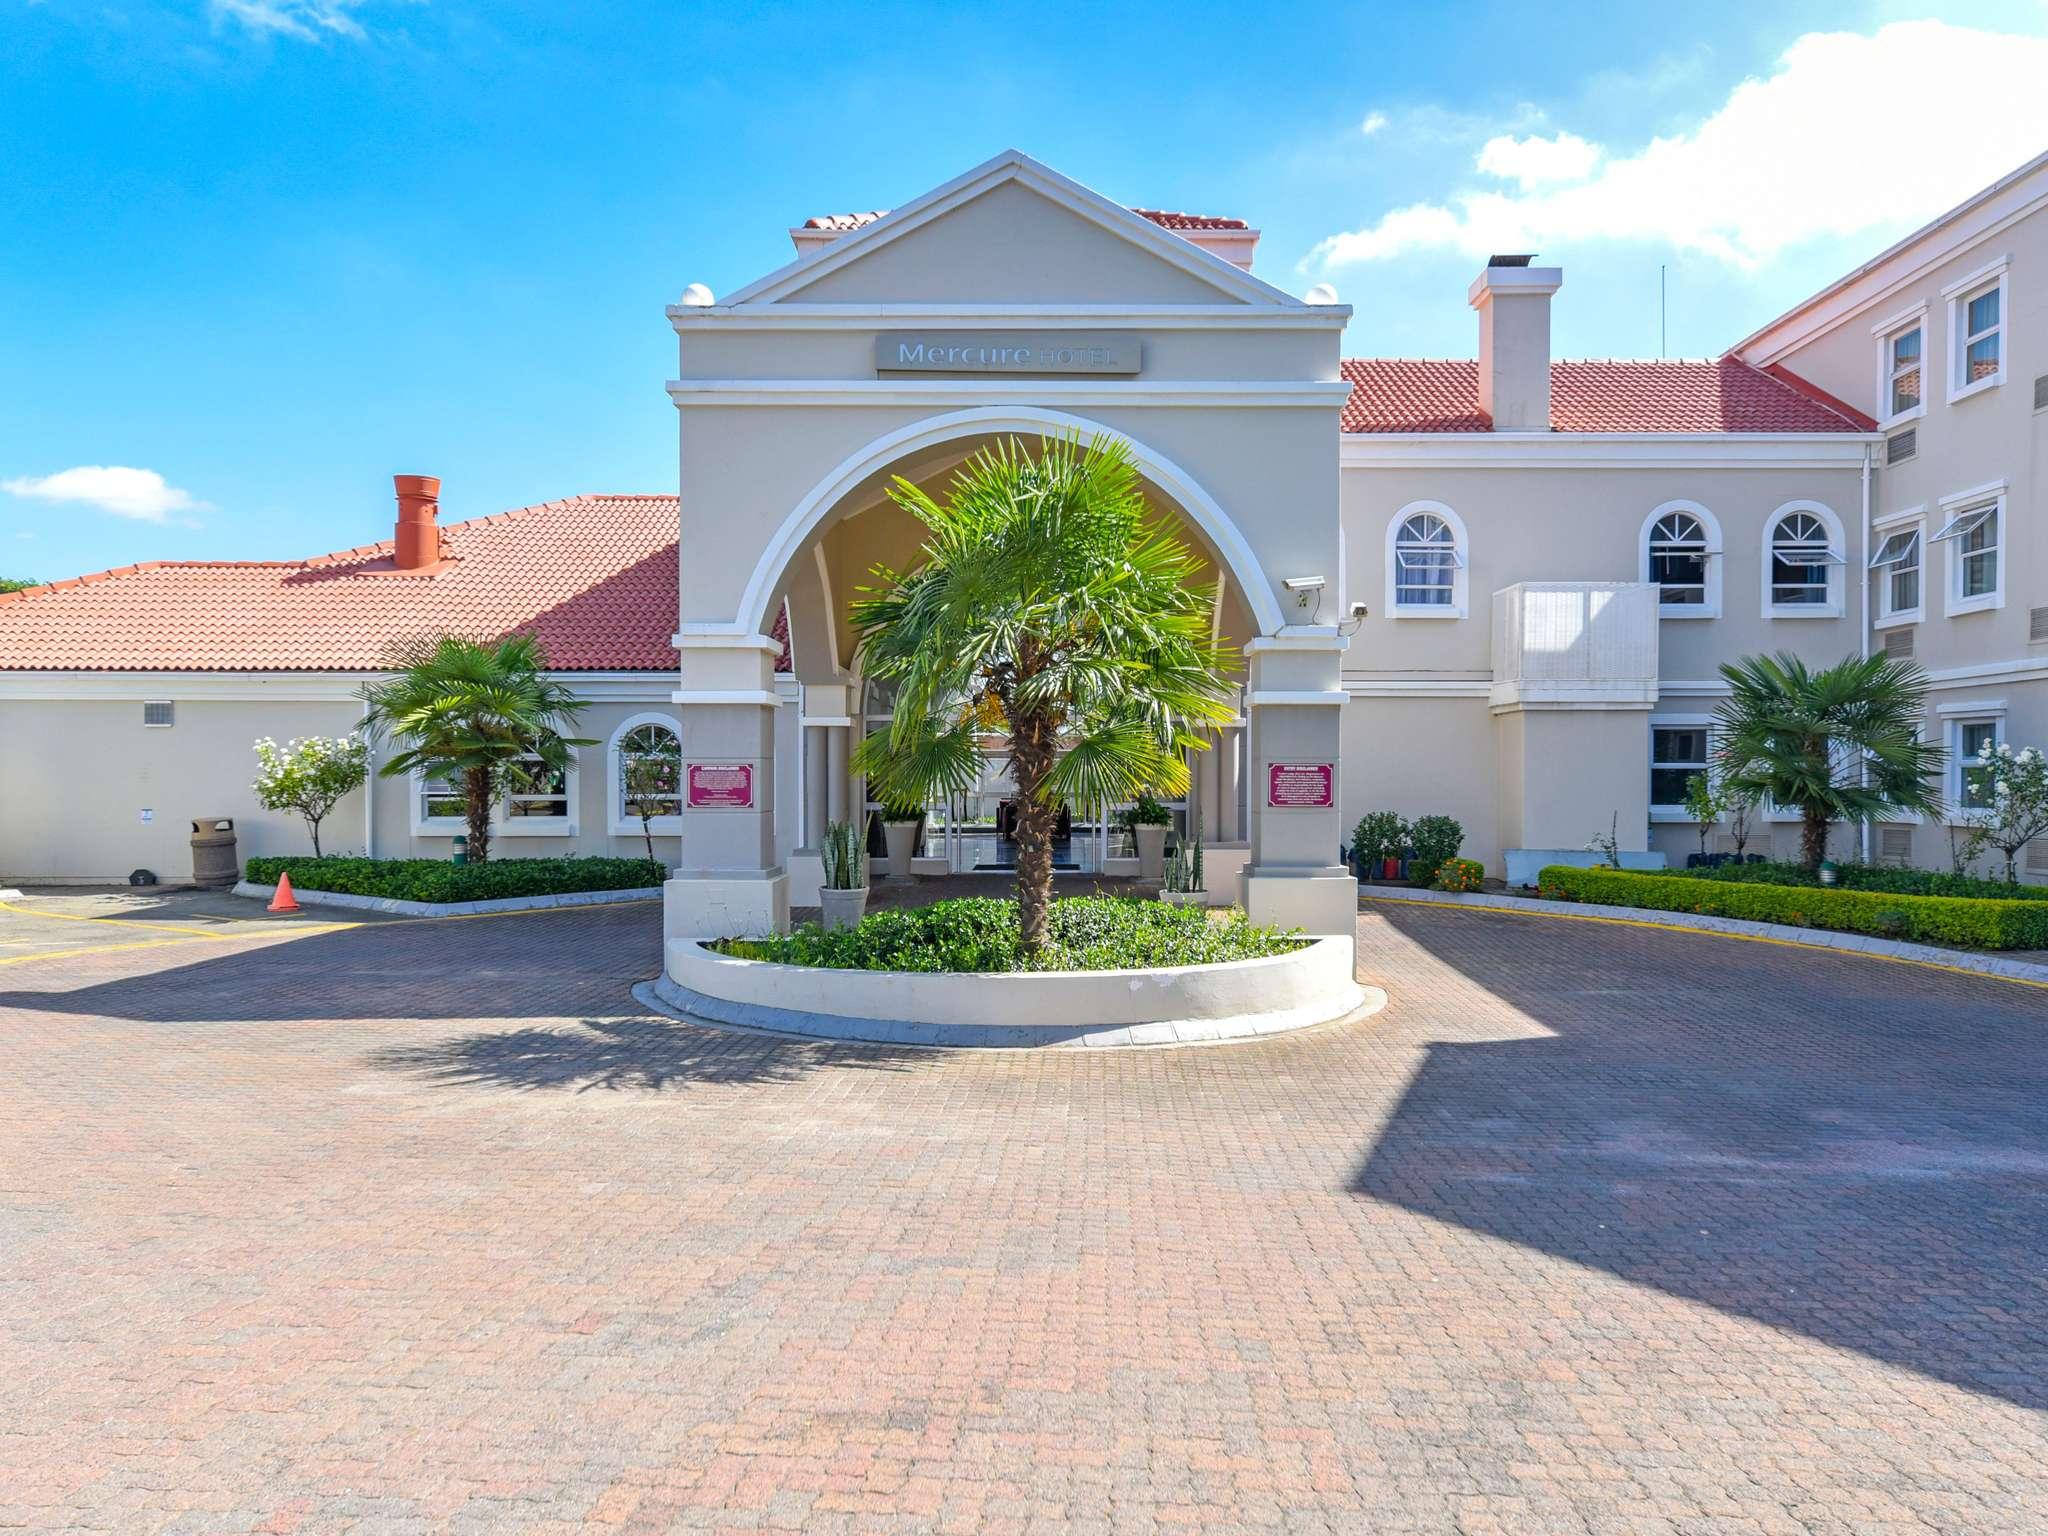 Hotell – Mercure Johannesburg Randburg Hotel